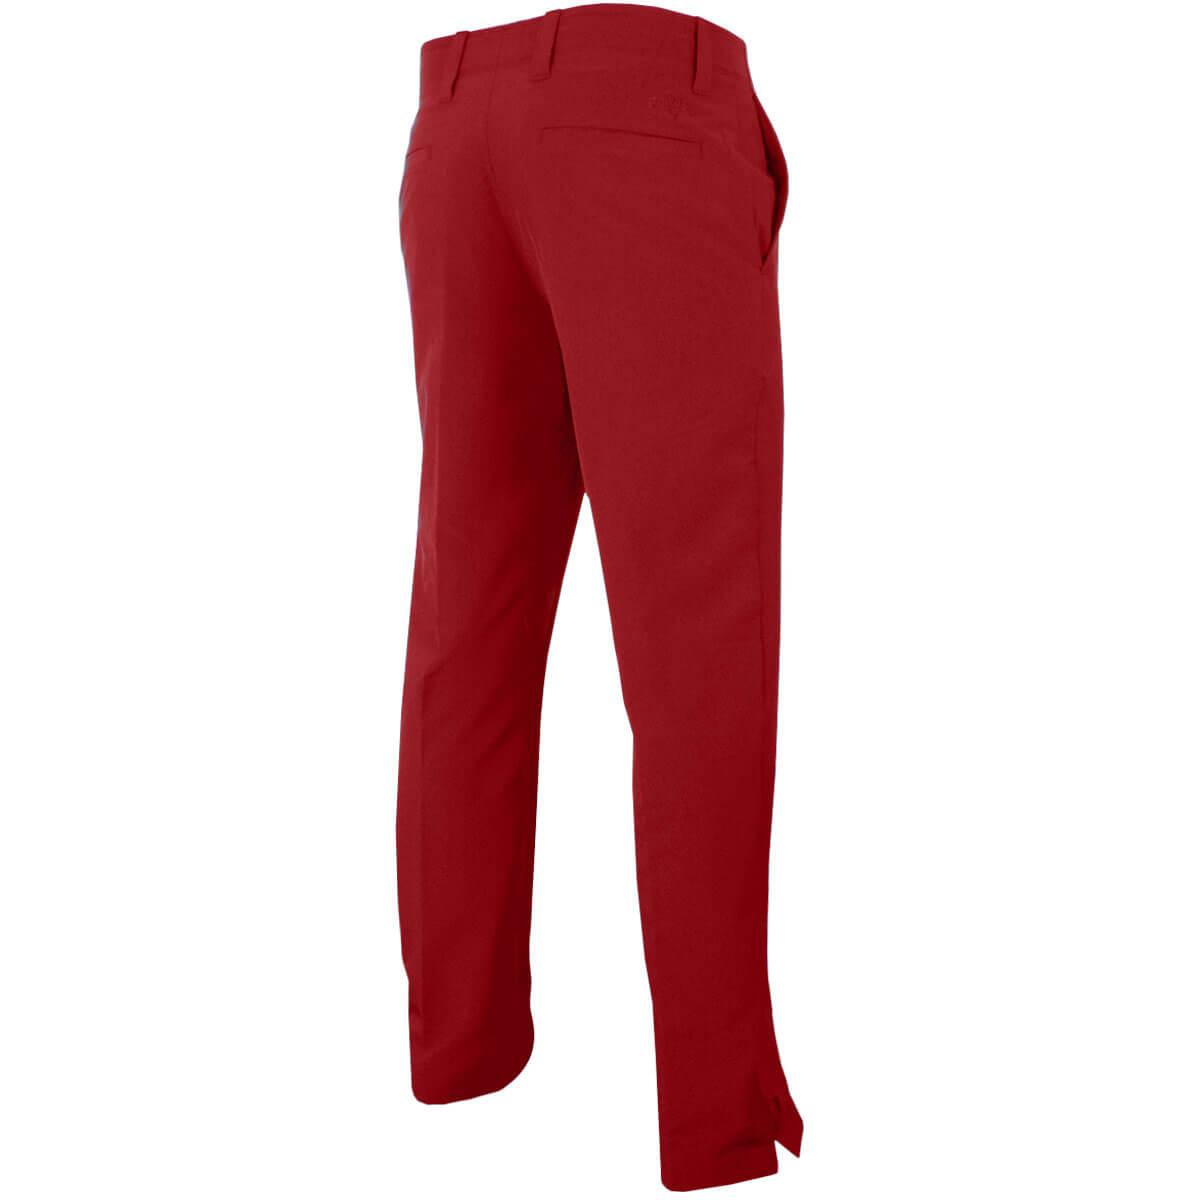 Callaway-Mens-2019-Chev-Tech-II-Lightweight-Stretch-Golf-Trousers-28-OFF-RRP thumbnail 9